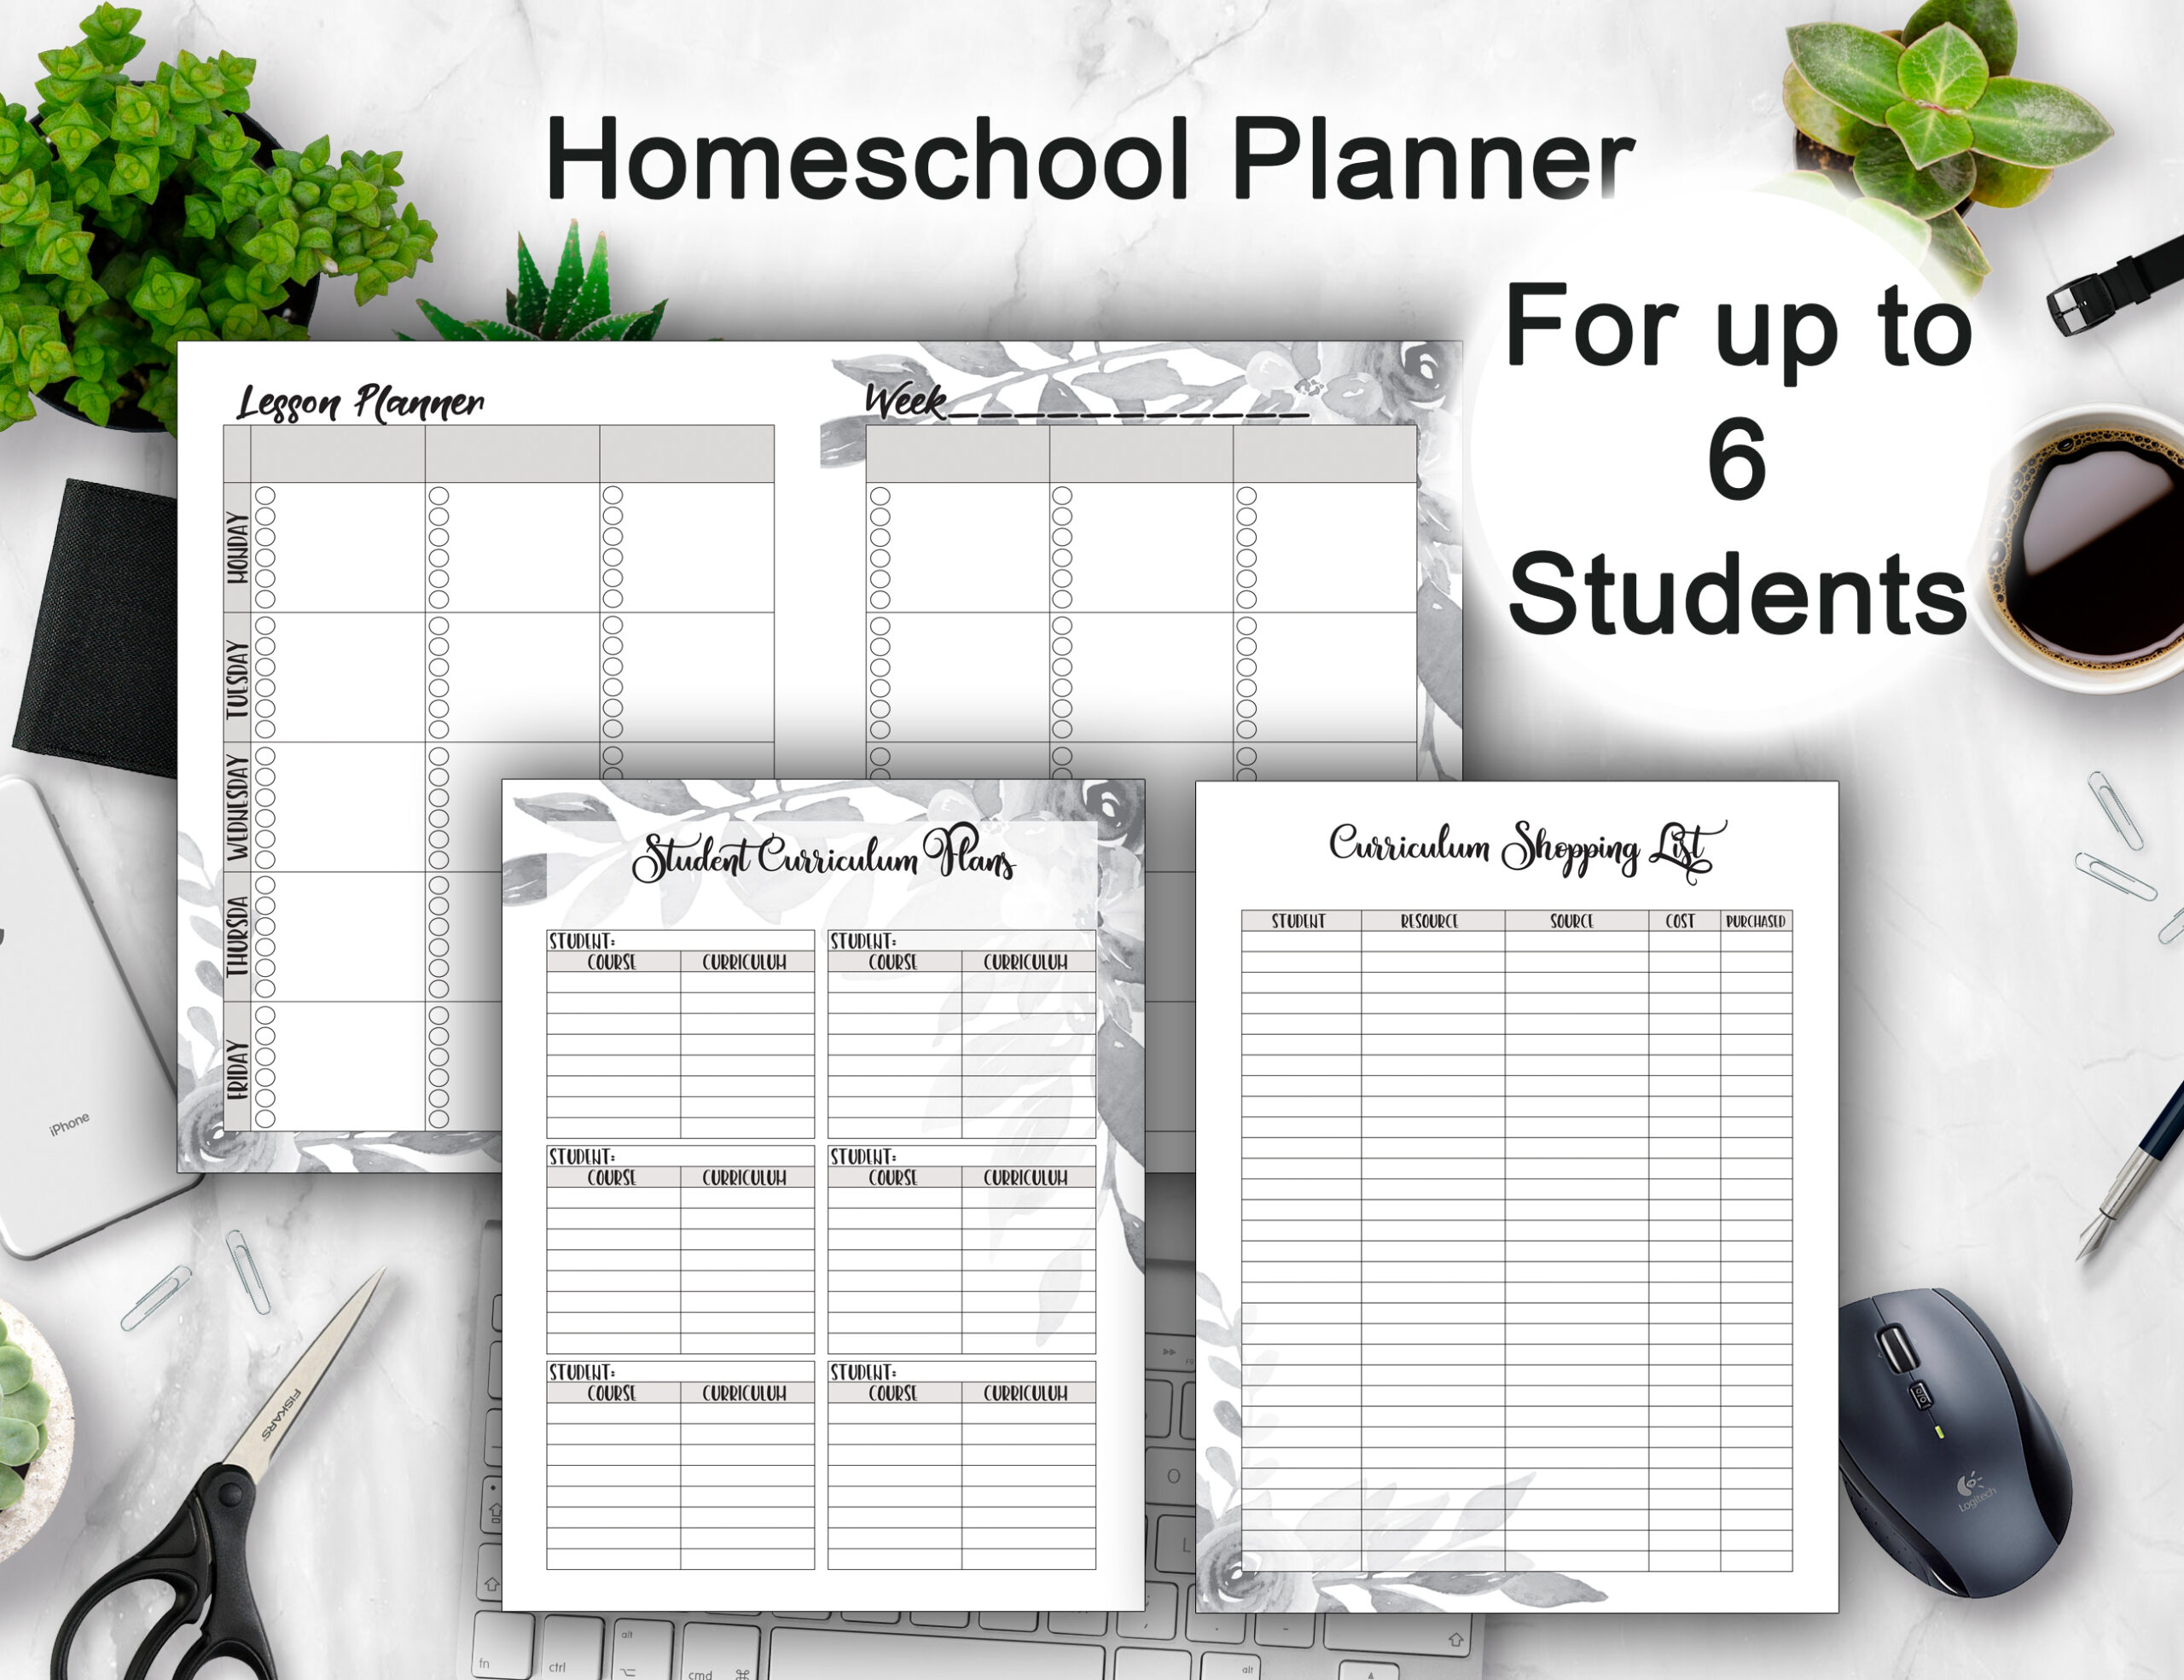 Weekly Homeschool Planner 2021 Calendars + Lesson Plans ...